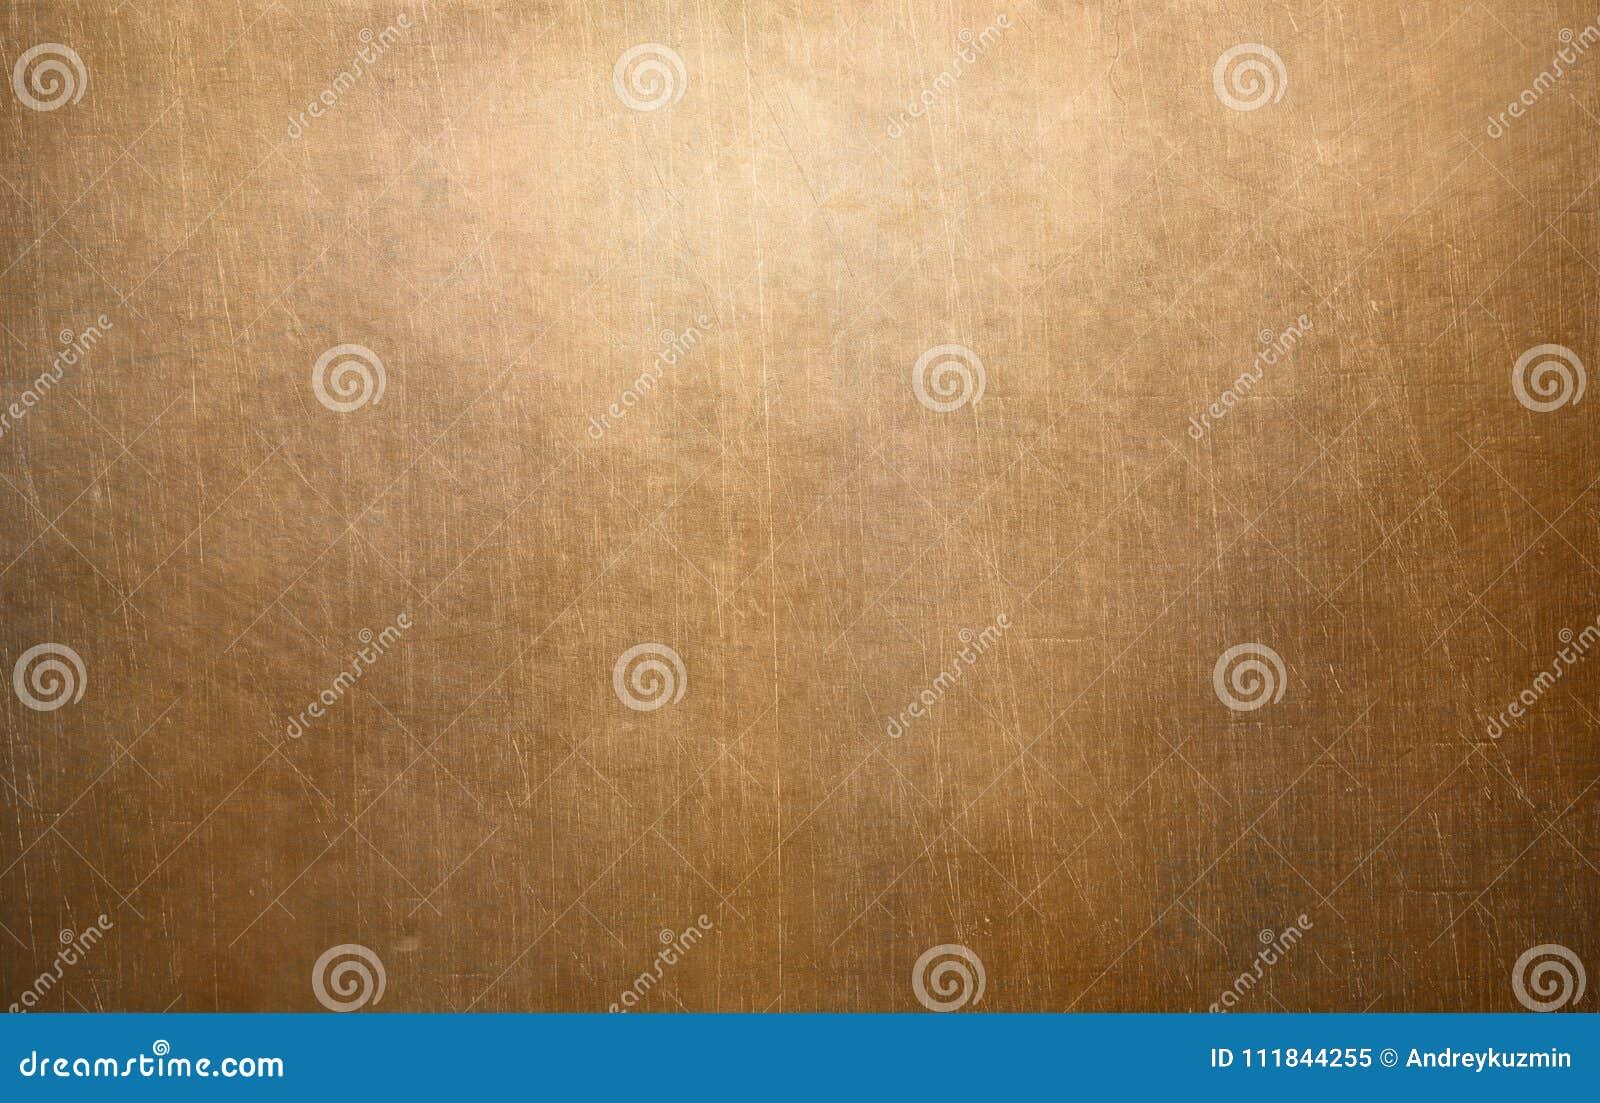 Stara groszaka lub brązu metalu tekstura